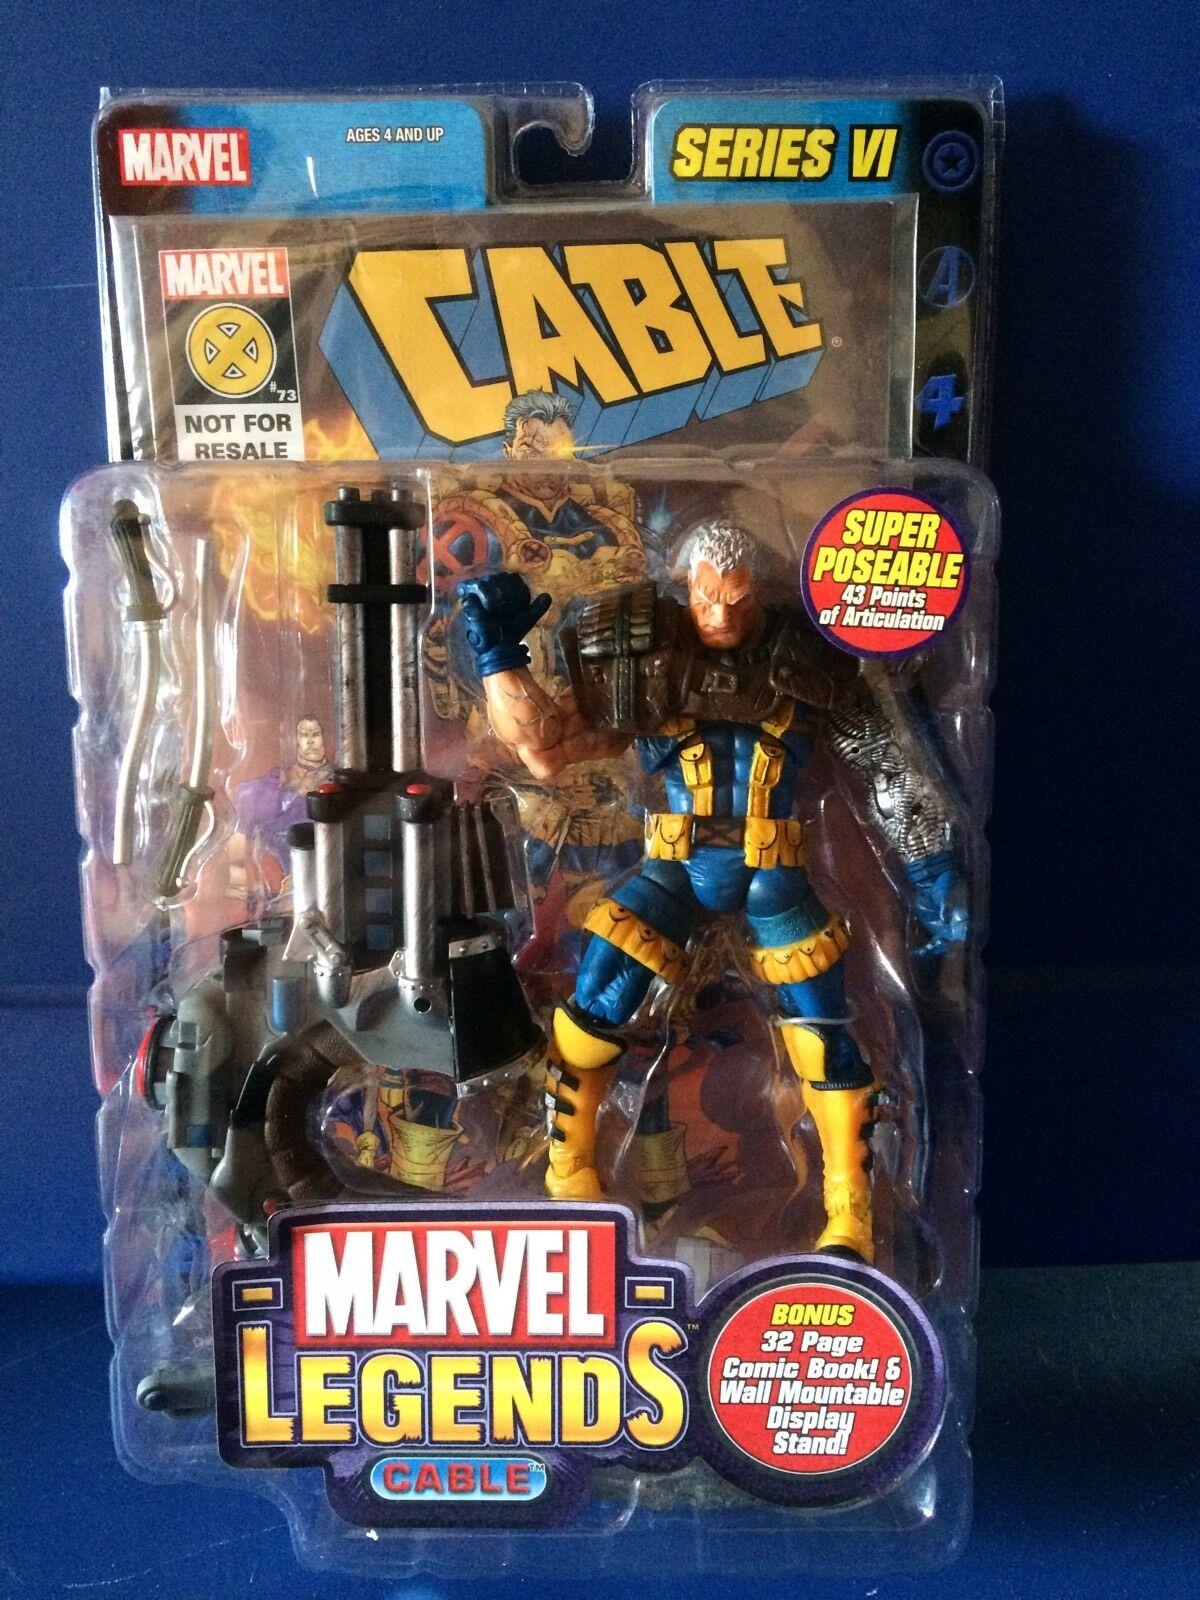 Marvel Legends Cable Series VI